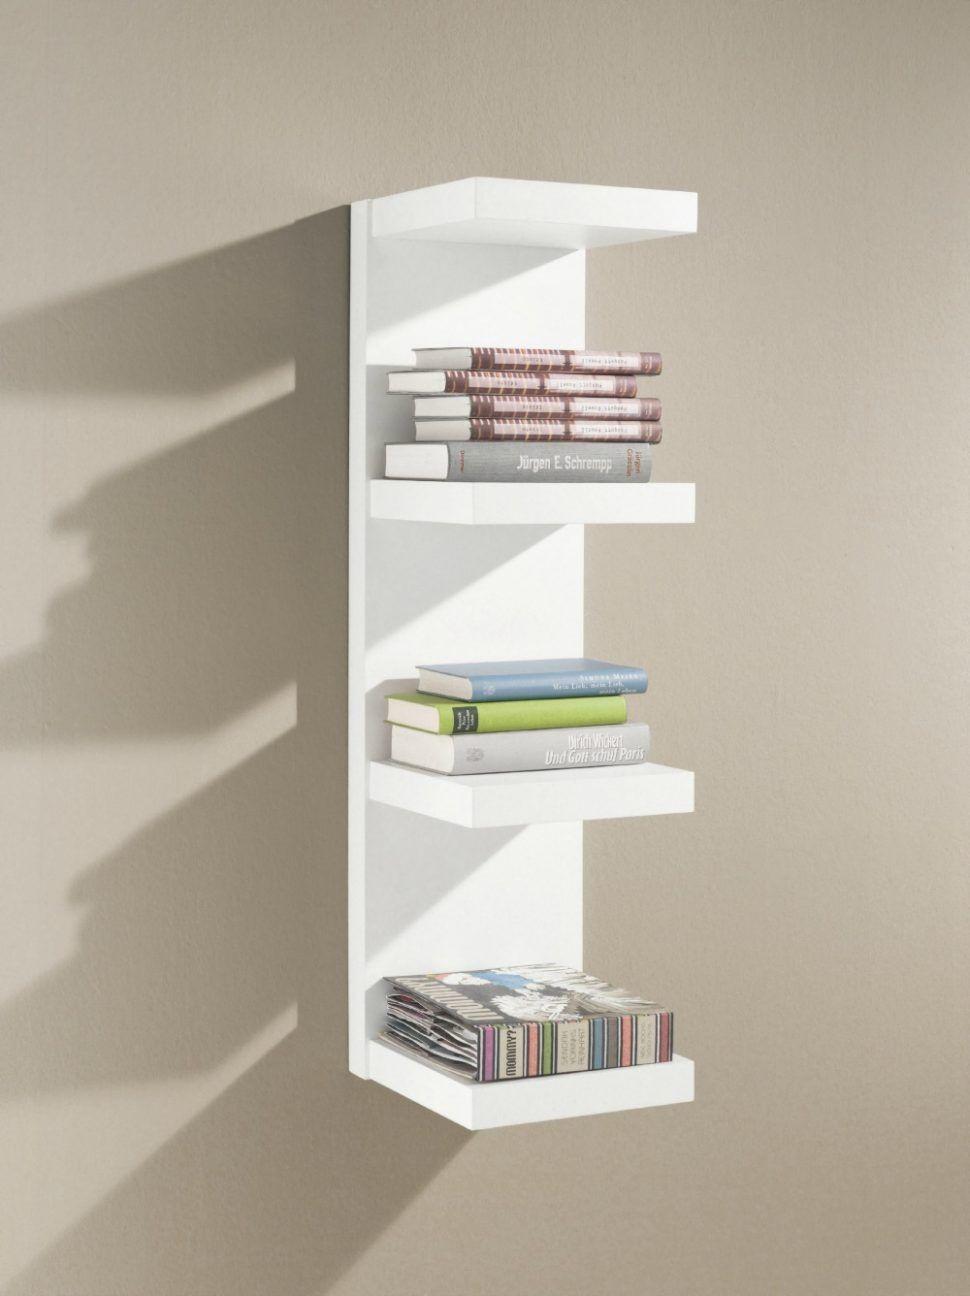 Image Result For 12 Inch Deep Shelf Wall Shelves Shelves Black Floating Shelves